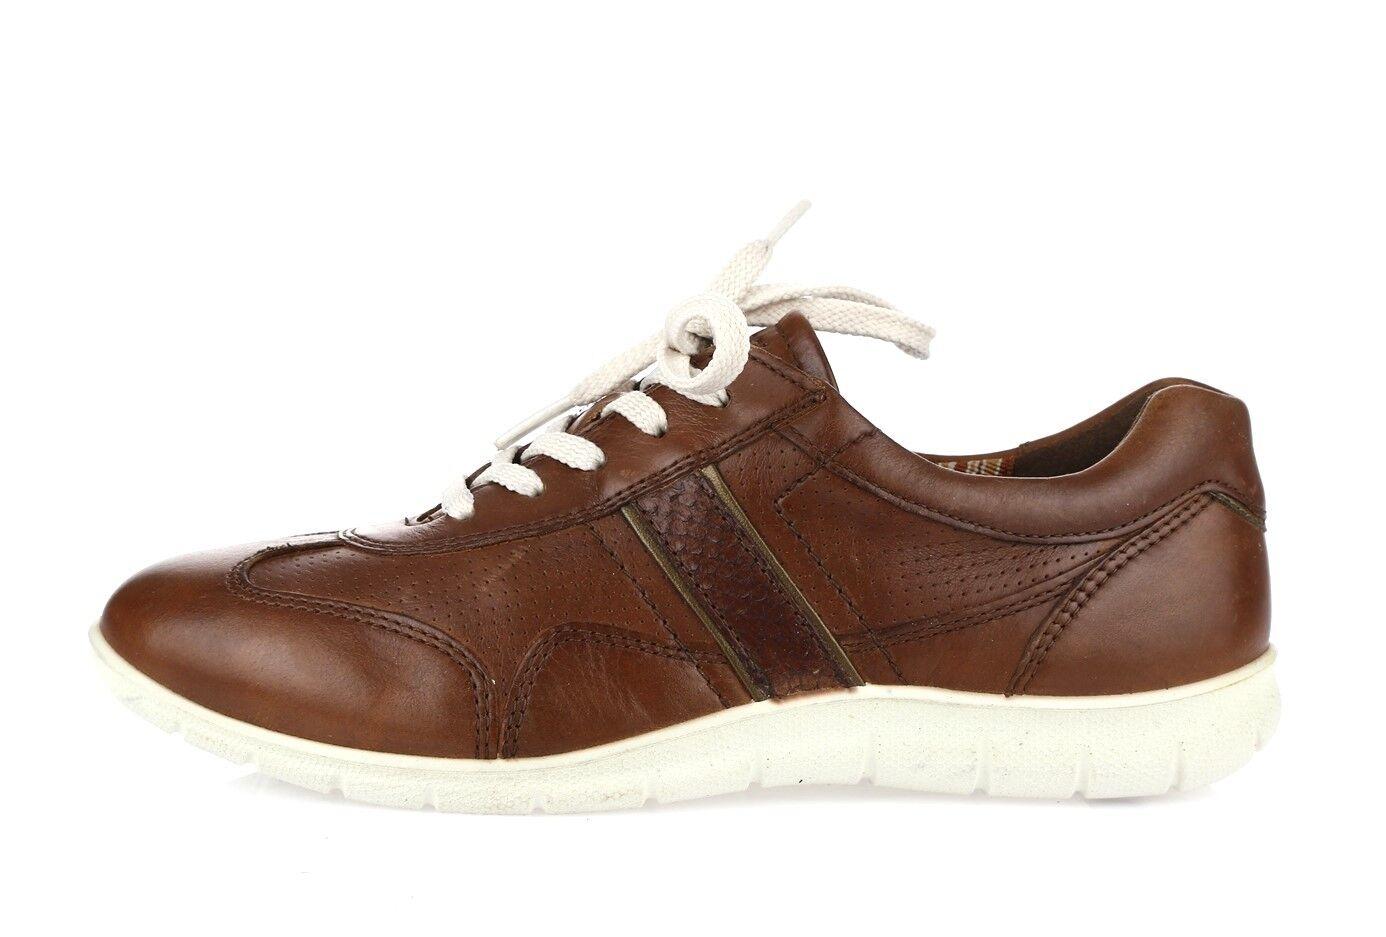 Donna ECCO leather brown sz. fashion scarpe da ginnastica/ shoes sz. brown 37 e7da7b